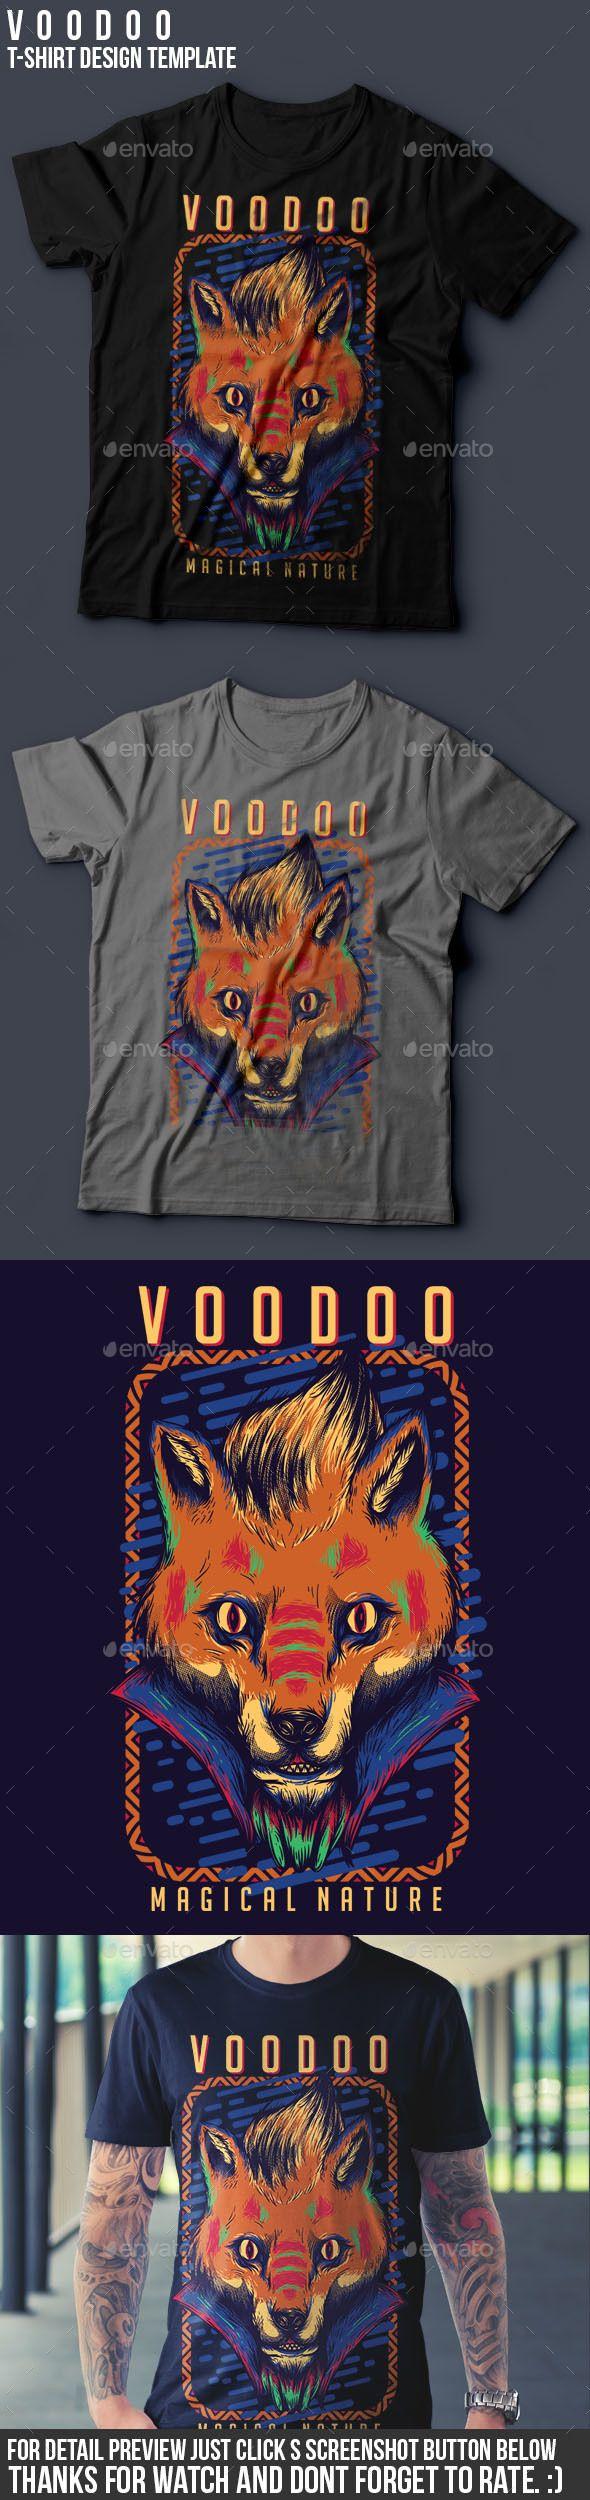 Design t shirt with illustrator - Voodoo T Shirt Design Template Vector Eps Transparent Png Ai Illustrator Download